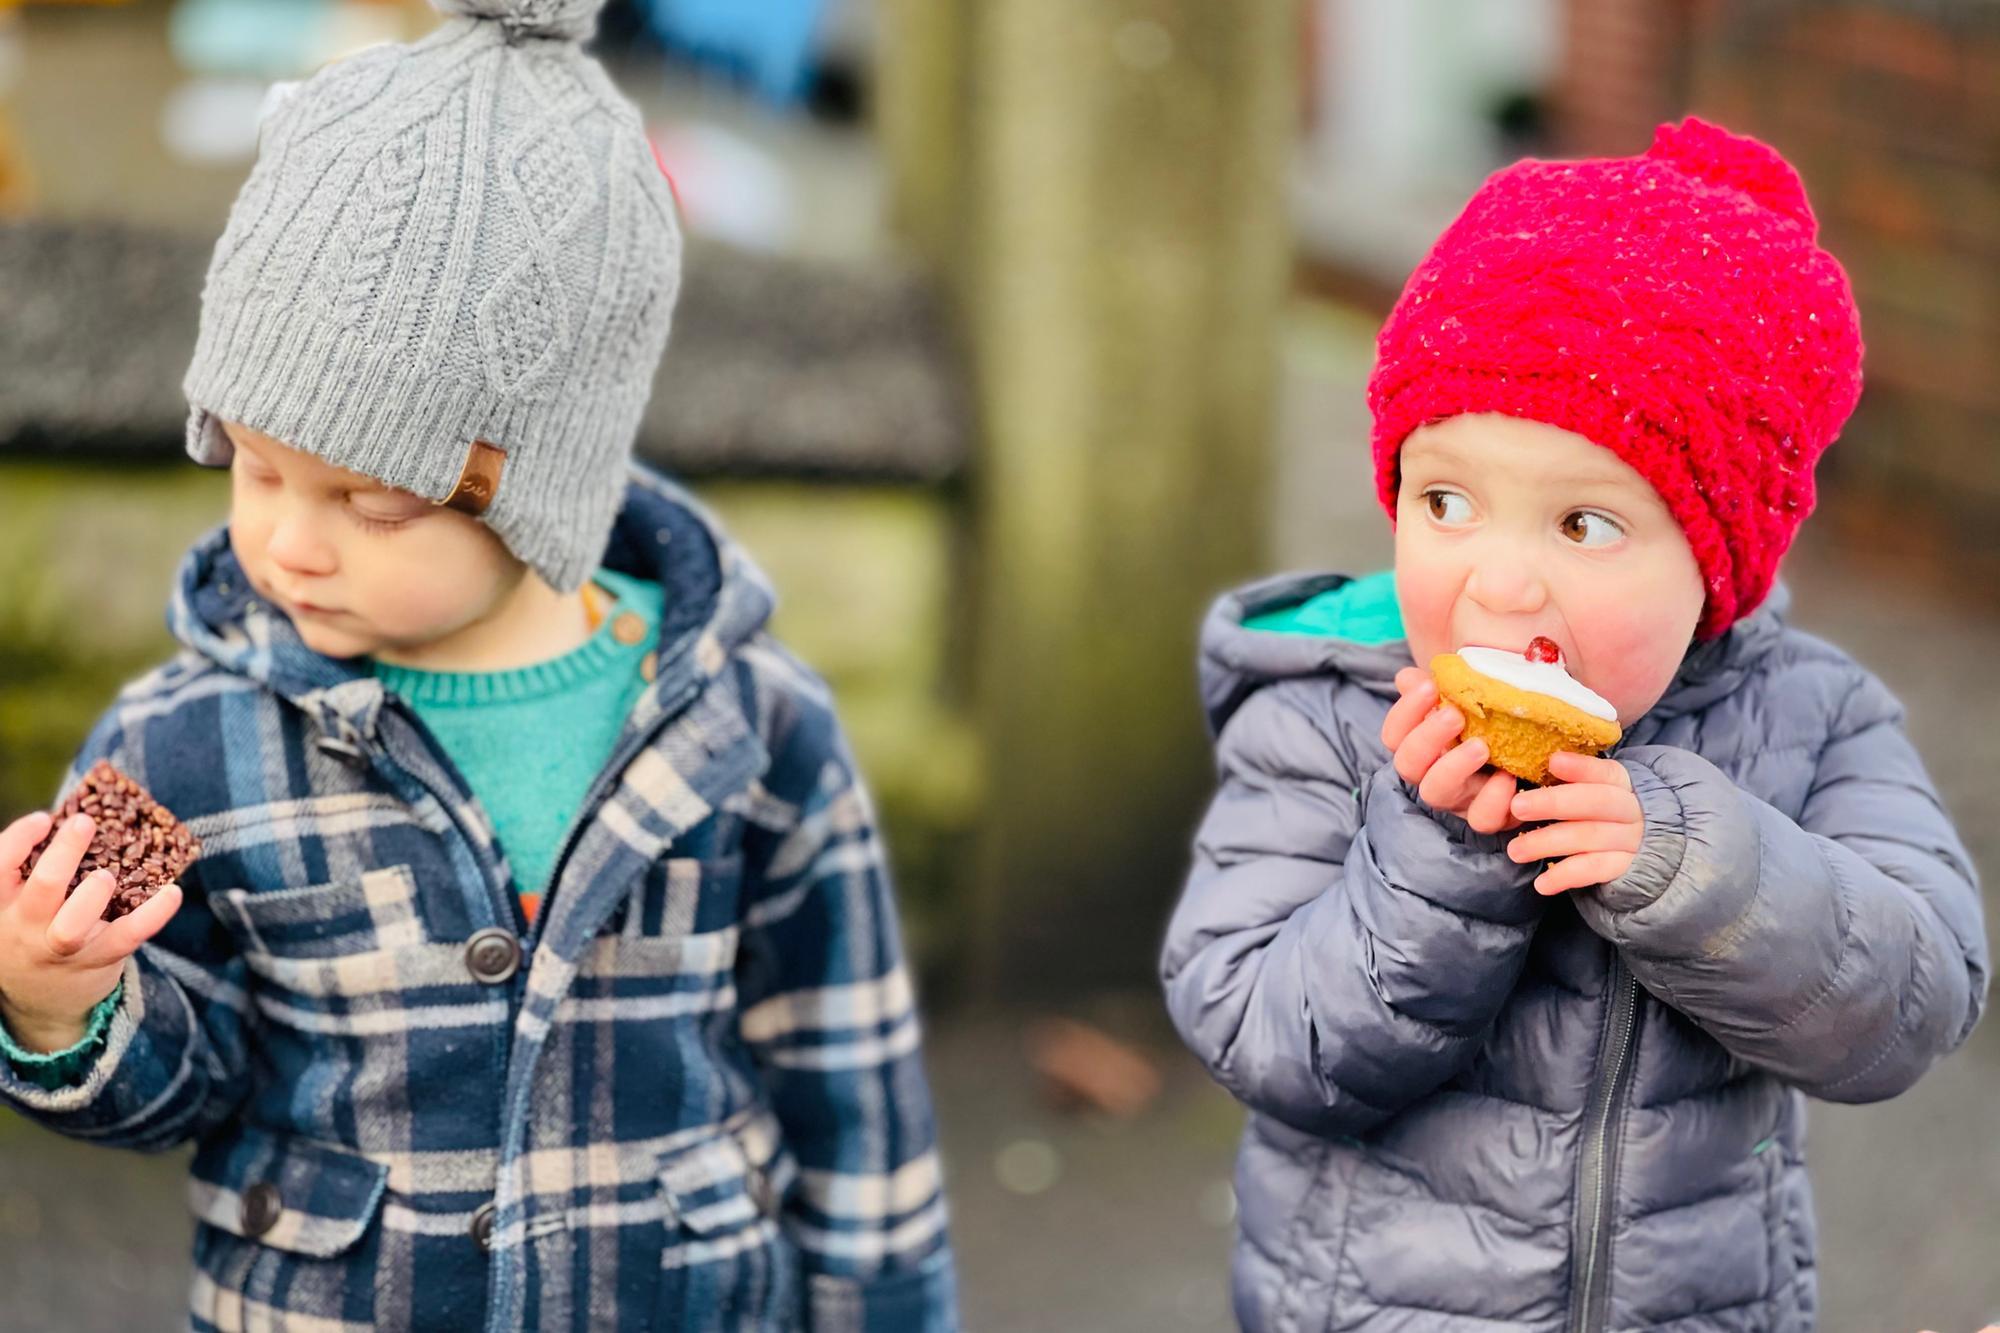 Socially-distanced 'Bunanza' bake sale raises £8.5k for Sheffield charities